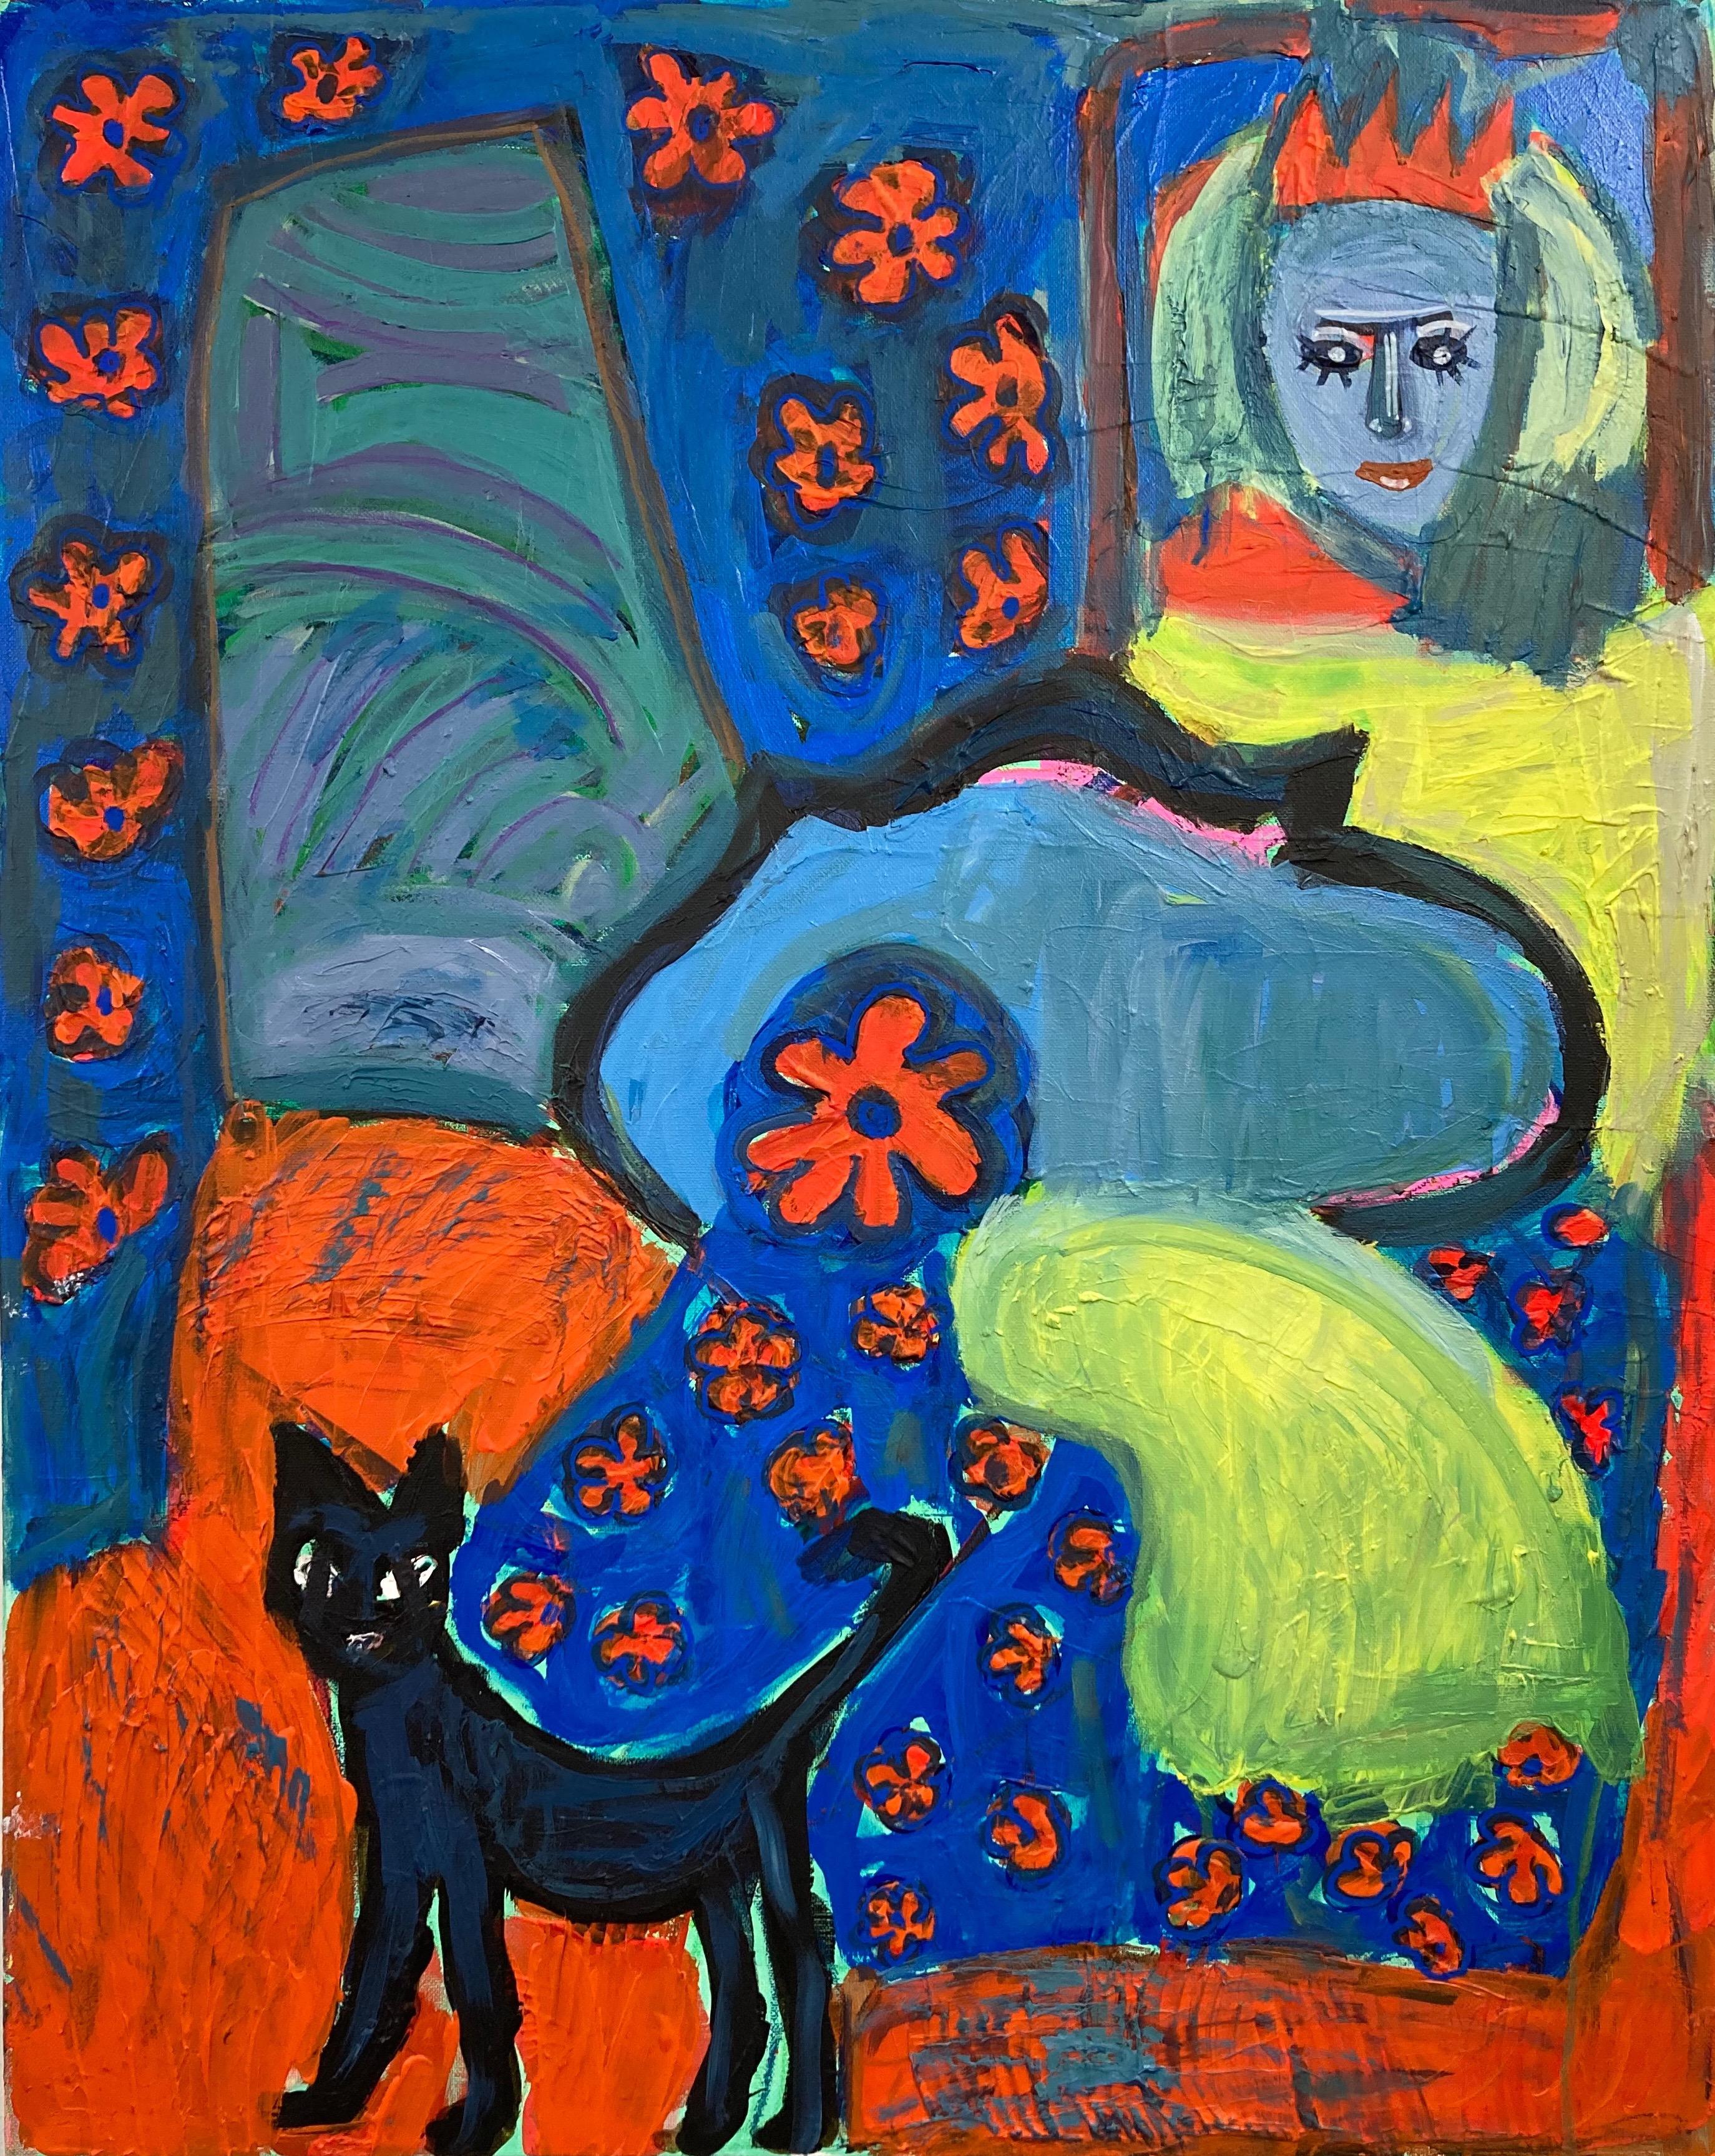 https://0201.nccdn.net/1_2/000/000/0a2/f1a/keeshan_judi_black-cat-in-my-room_acrylic-on-canvas_30x24-.jpg